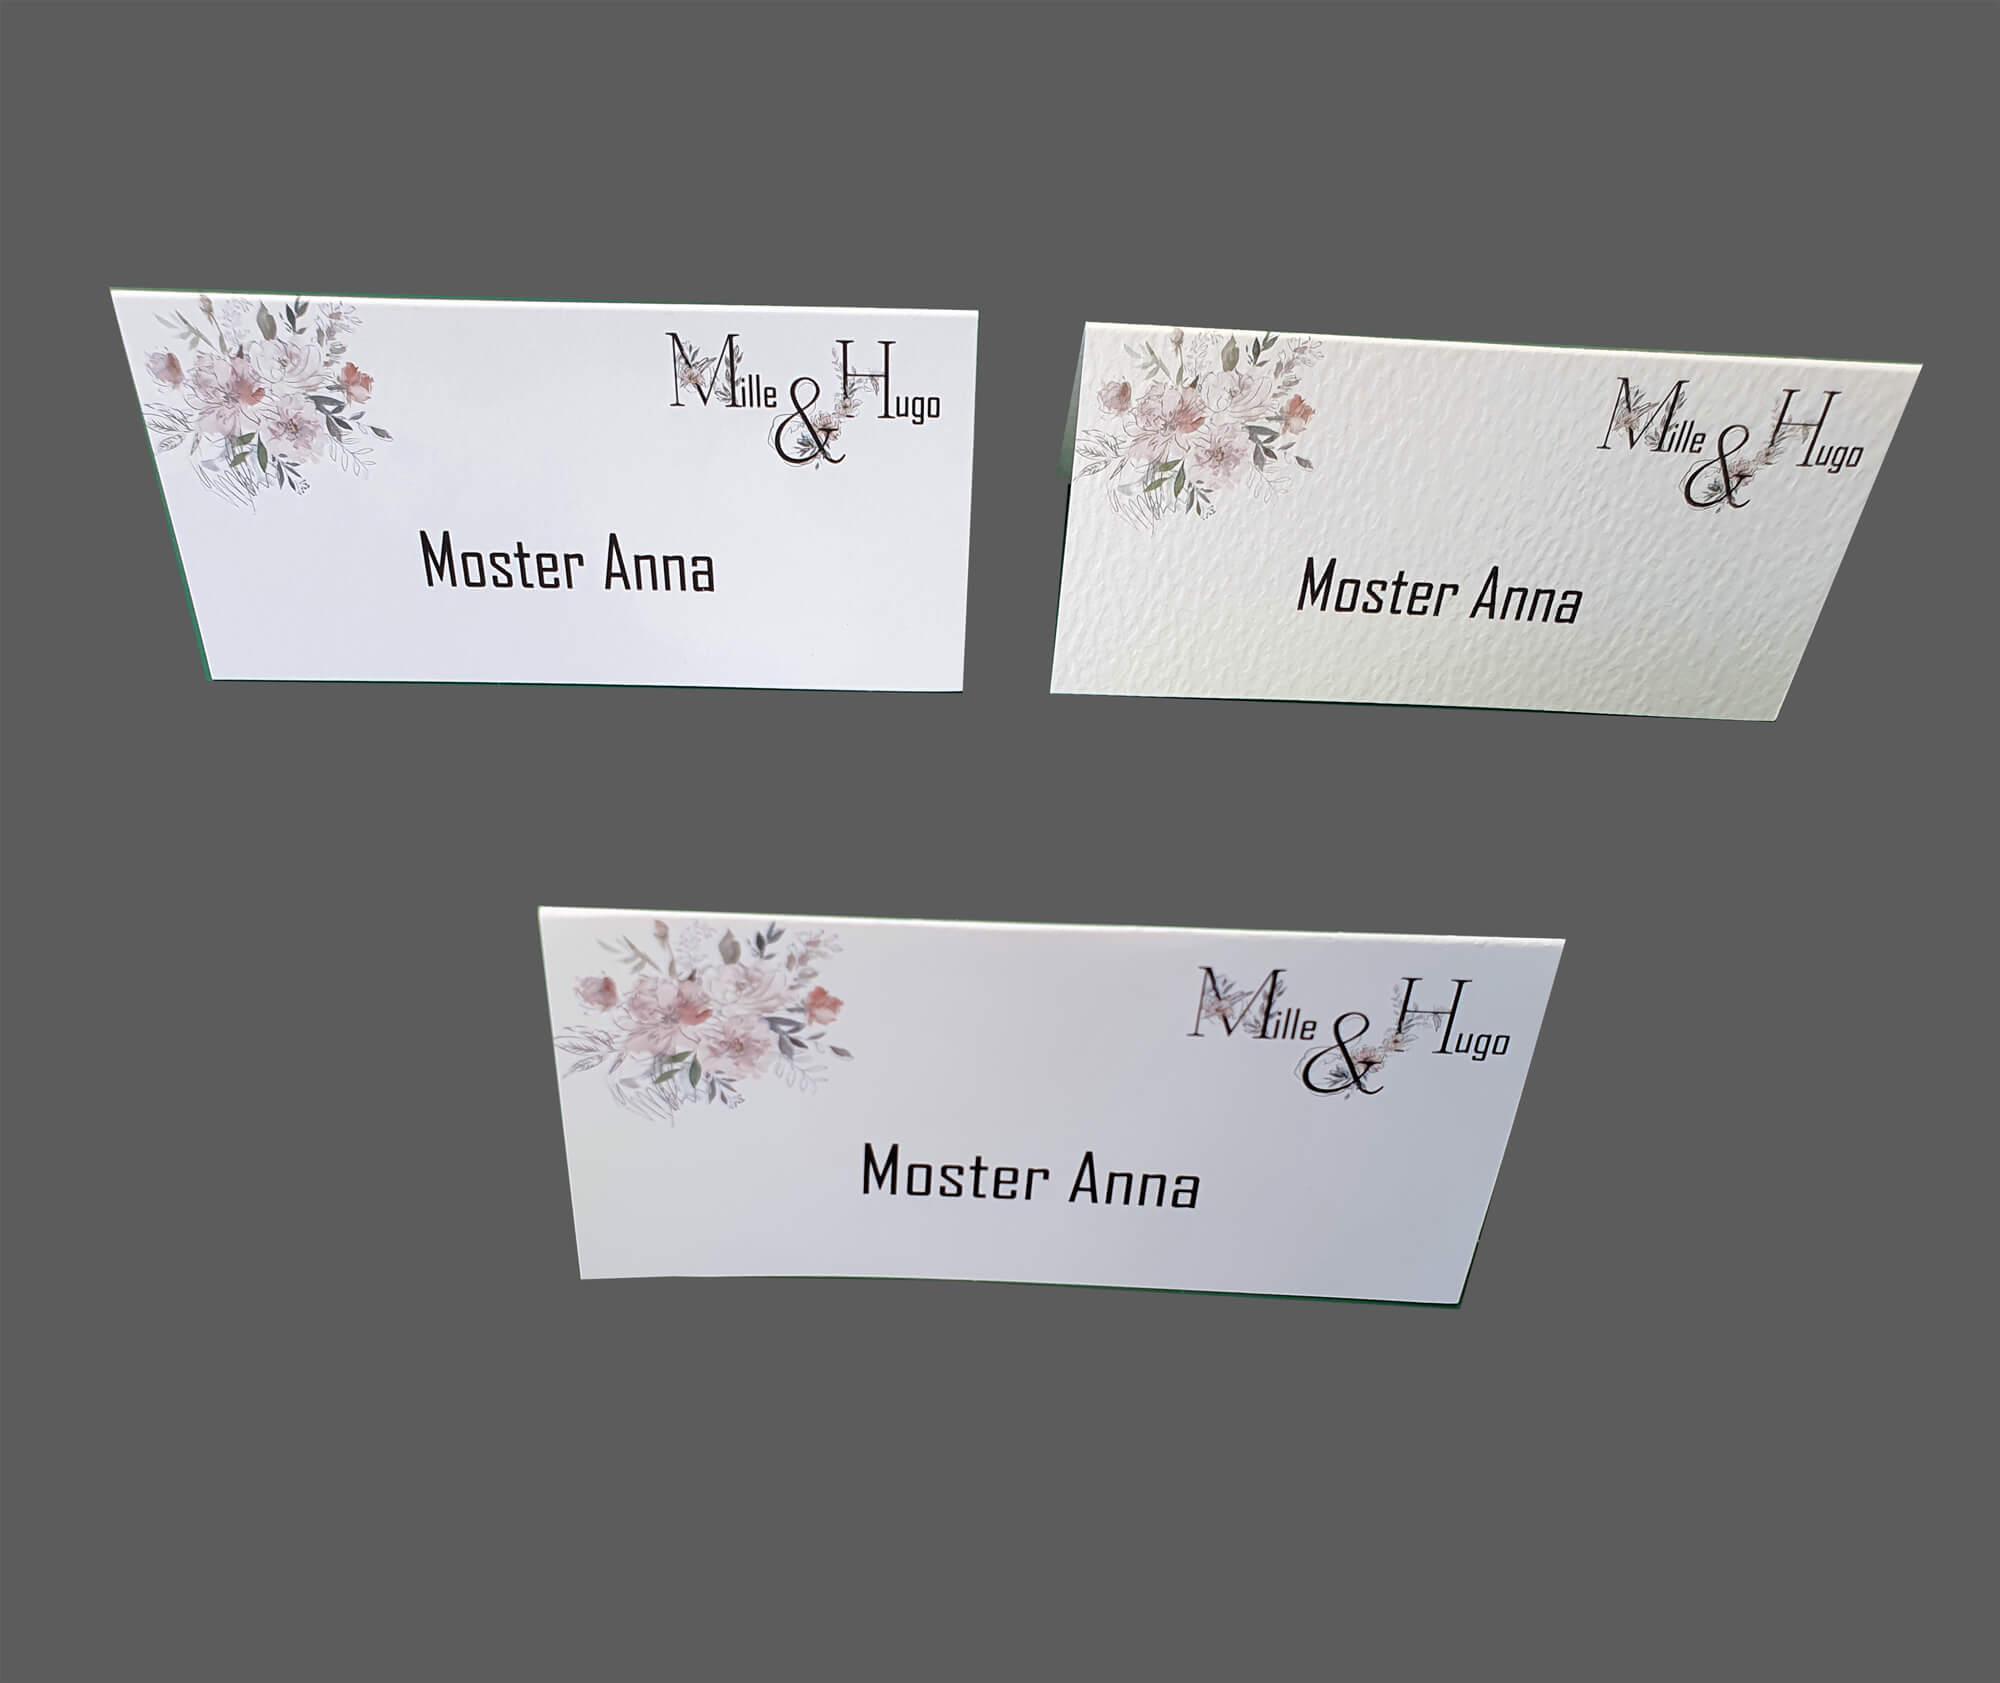 Print af bordkort på kvalitetskarton